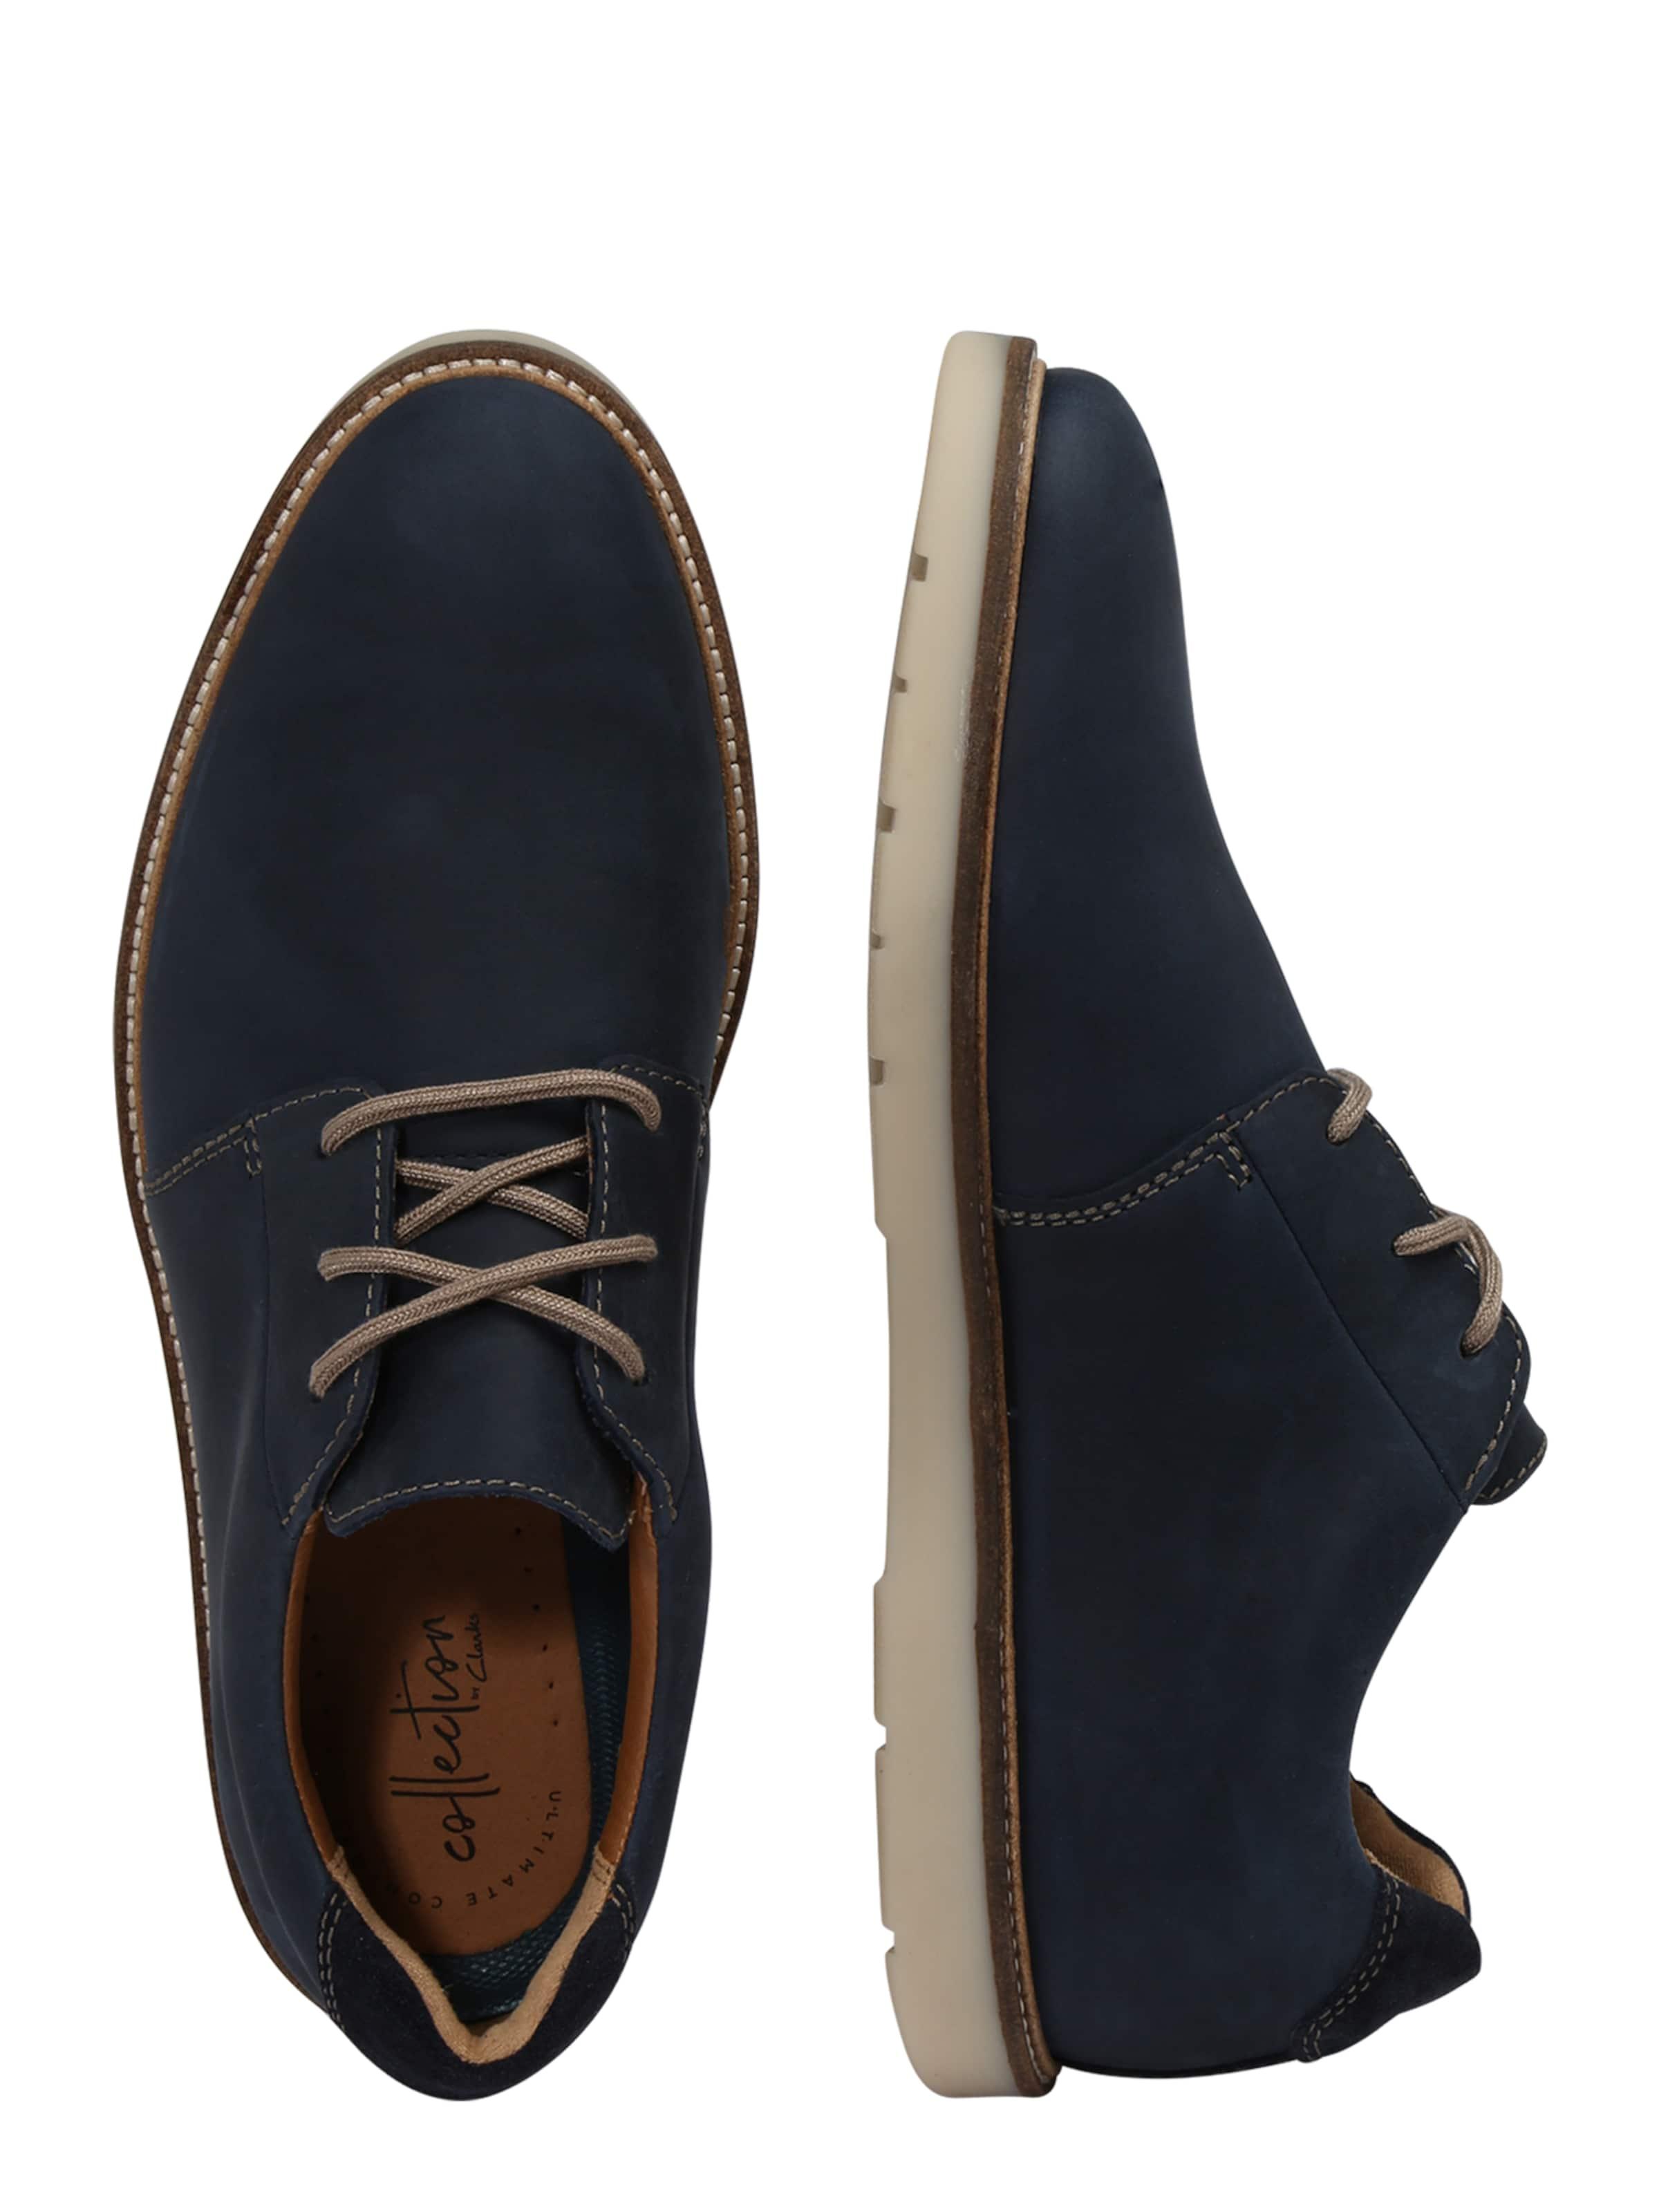 Chaussure En Clarks 'grandin Marine Lacets À Plain' Bleu mPvN08ynwO